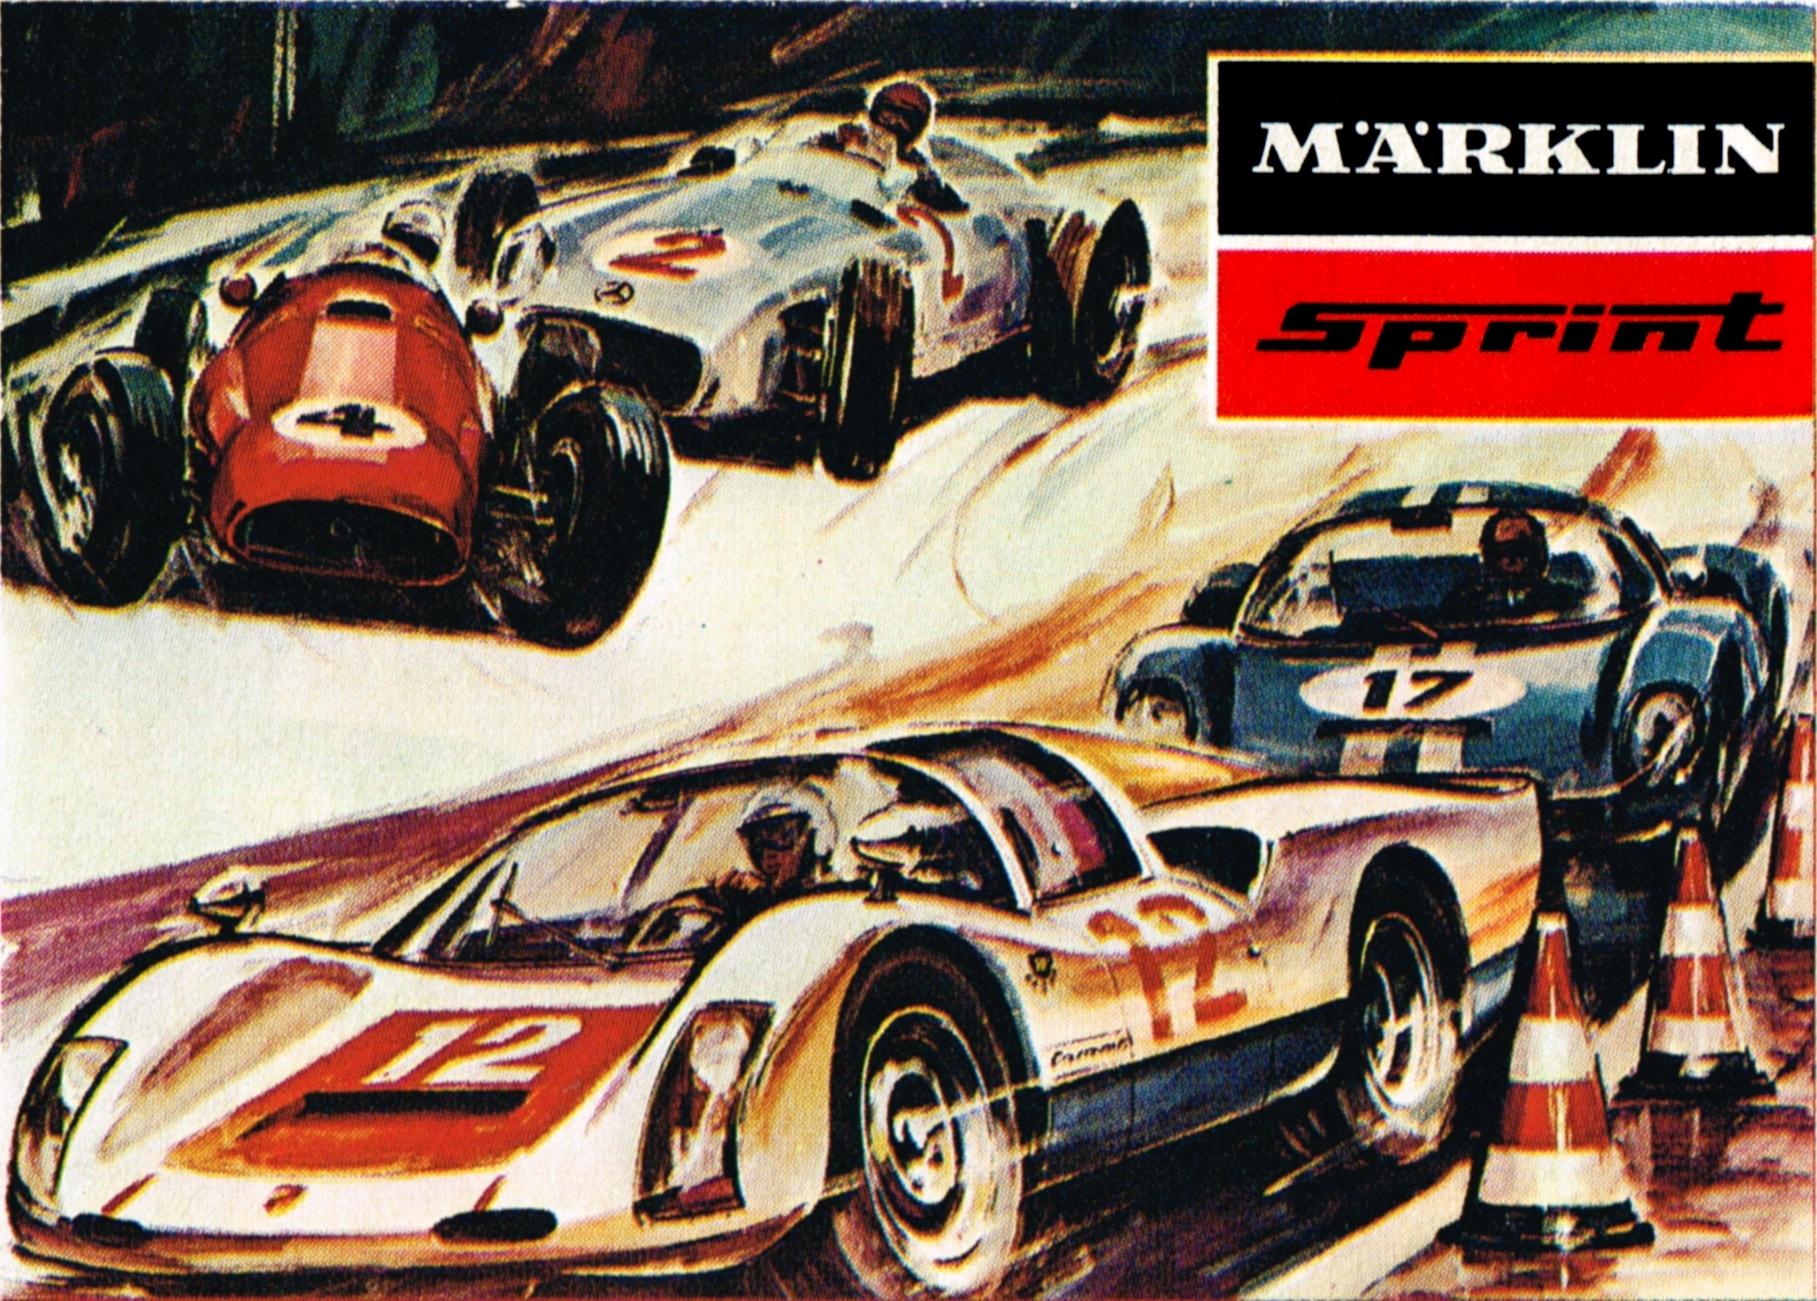 Péliméon, réseau Ho - Hom - Page 4 Marklin_Sprint,_box_artwork_(Marklin_1971)